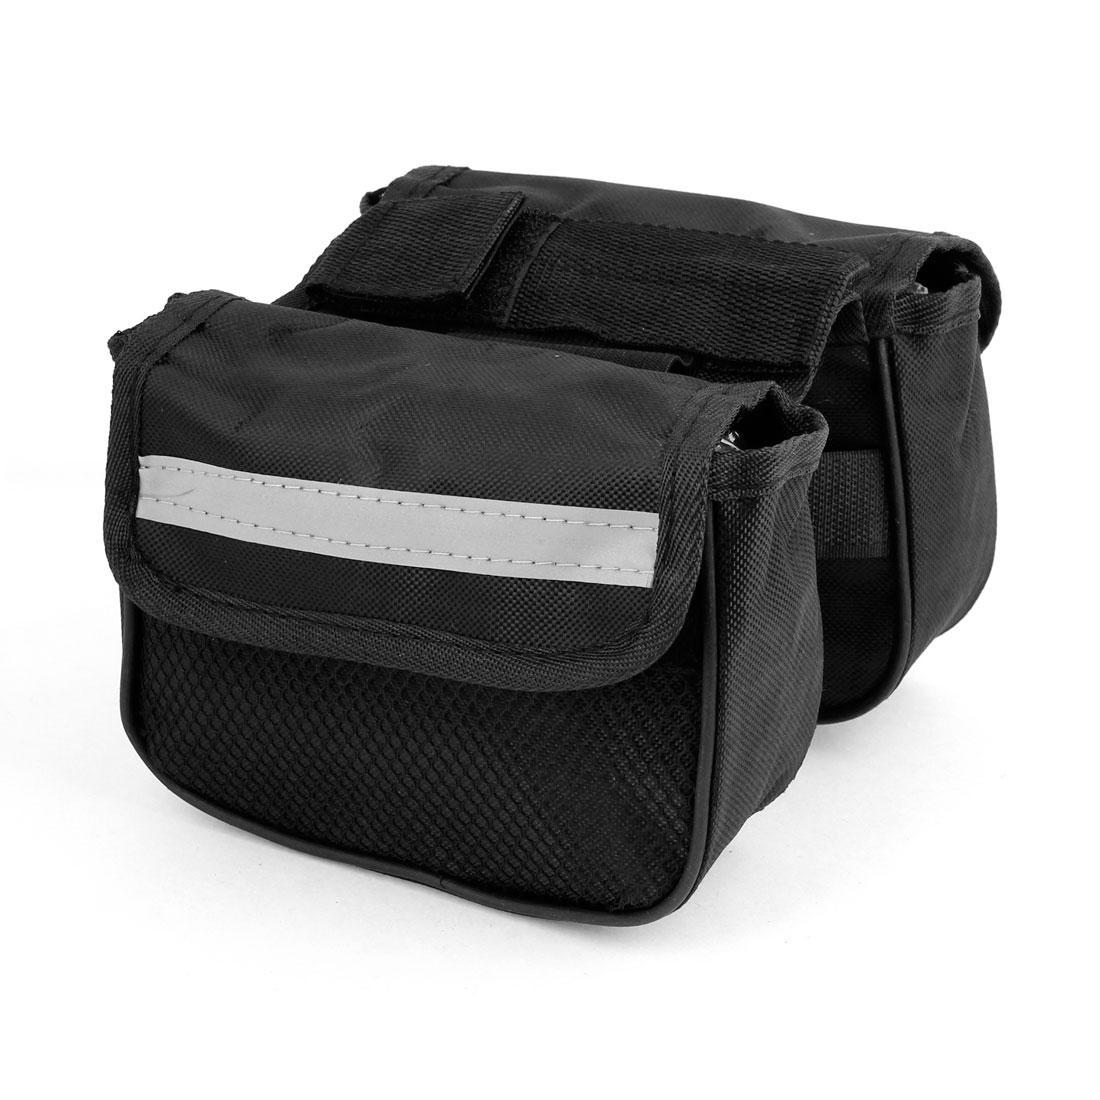 Affix Fastener Black Nylon Double Saddle Front Bag for Bike Bicycle